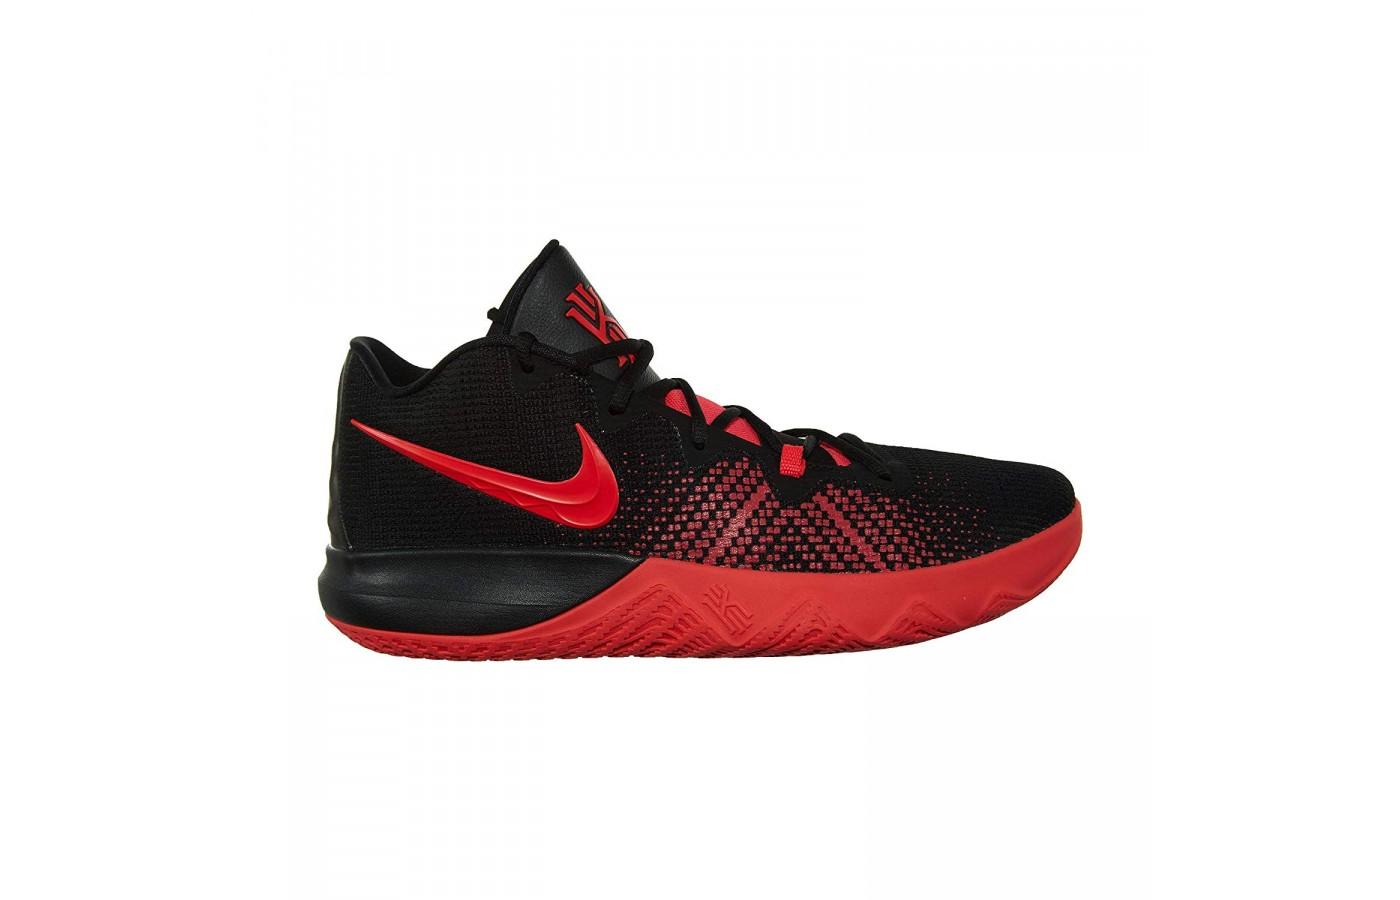 Nike Kyrie Flytrap Outsole